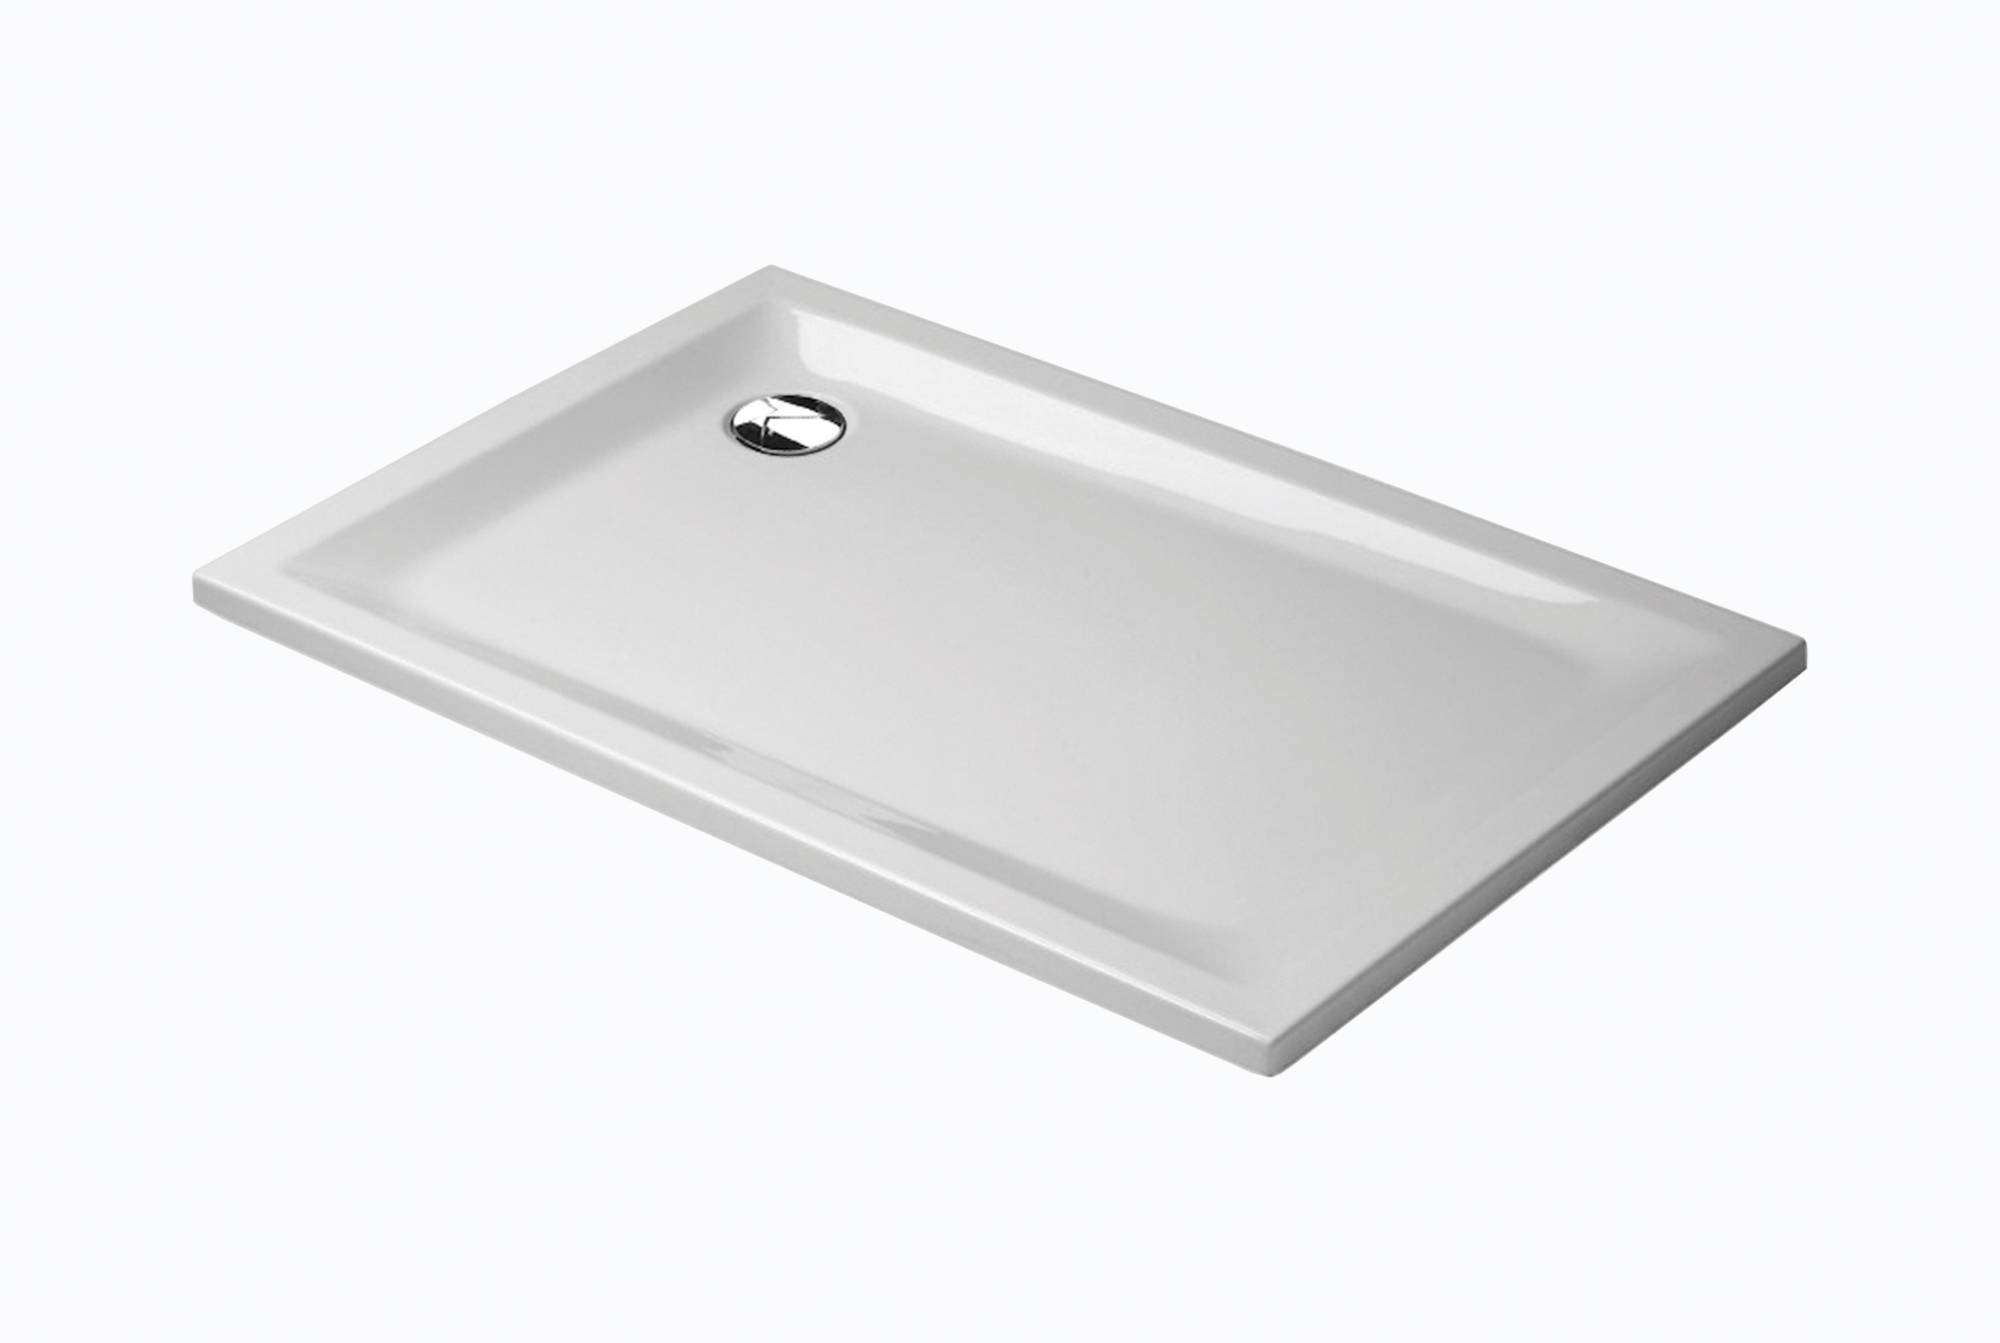 Sealskin Spazio douchebak rechthoek 120x90cm, wit